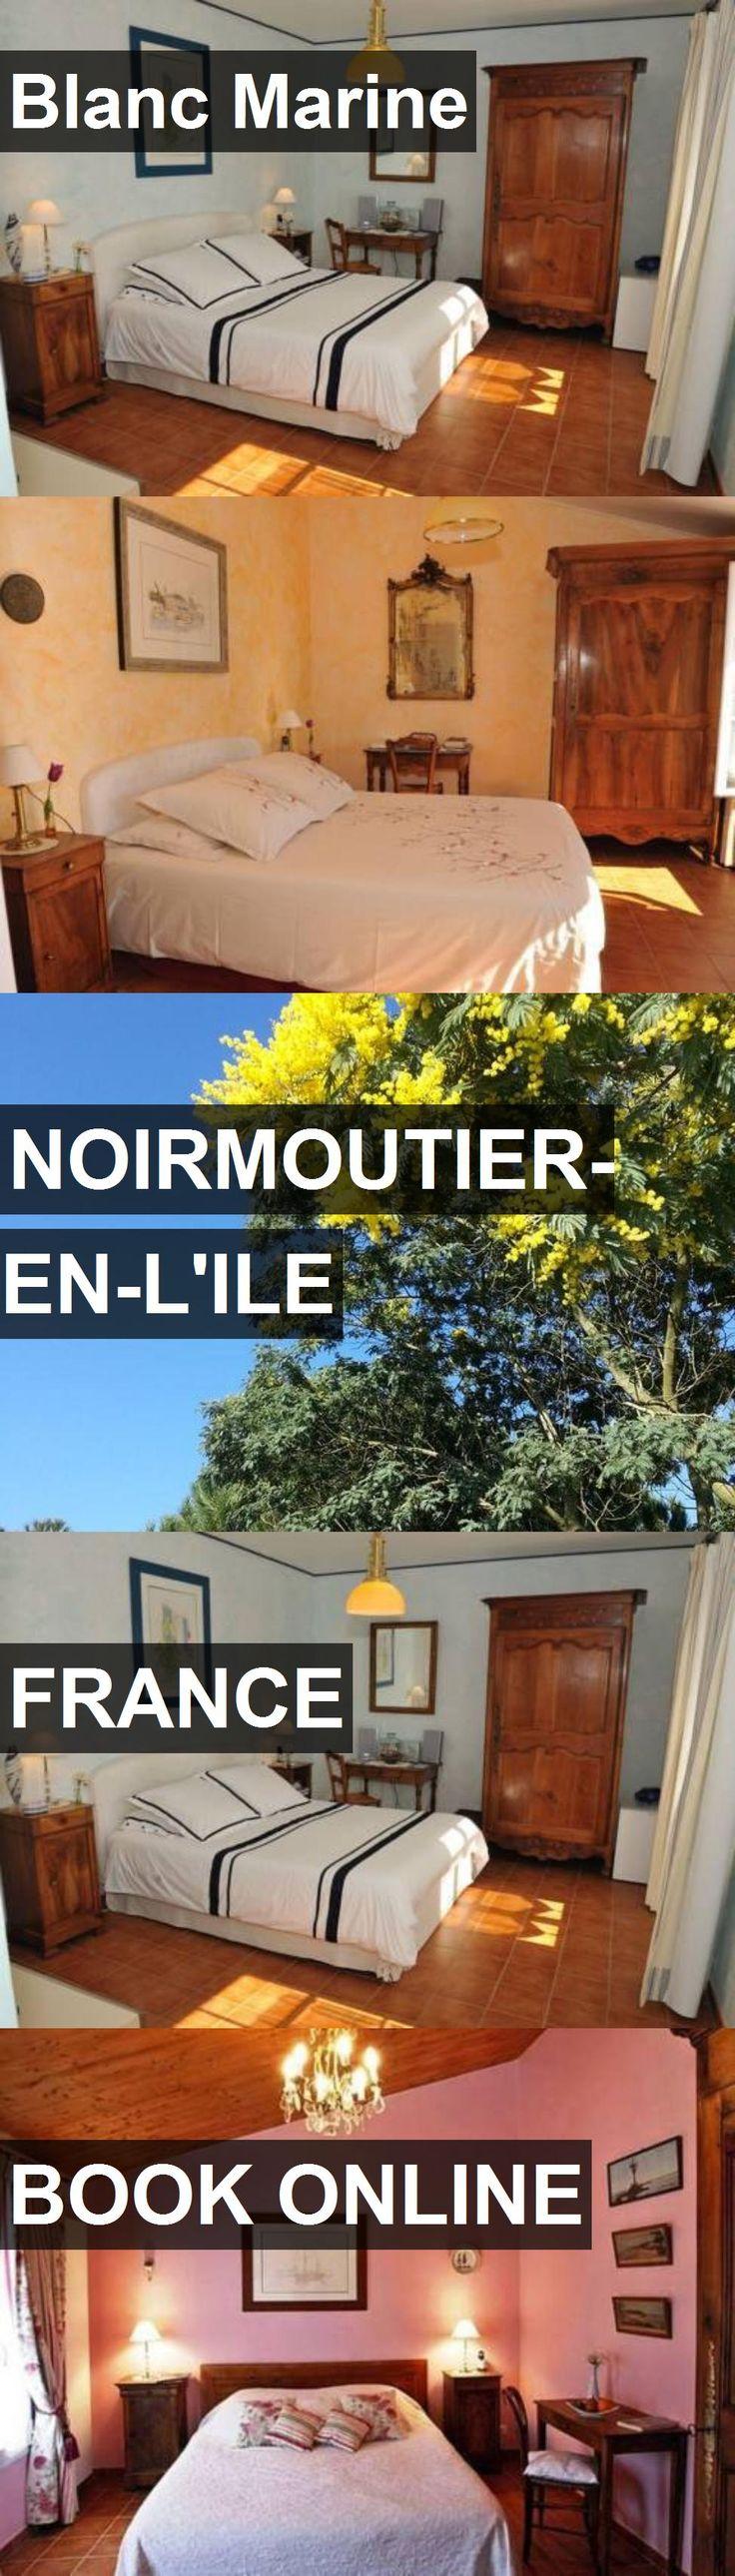 Hotel Blanc Marine in Noirmoutier-en-l'Ile, France. For more information, photos, reviews and best prices please follow the link. #France #Noirmoutier-en-l'Ile #travel #vacation #hotel